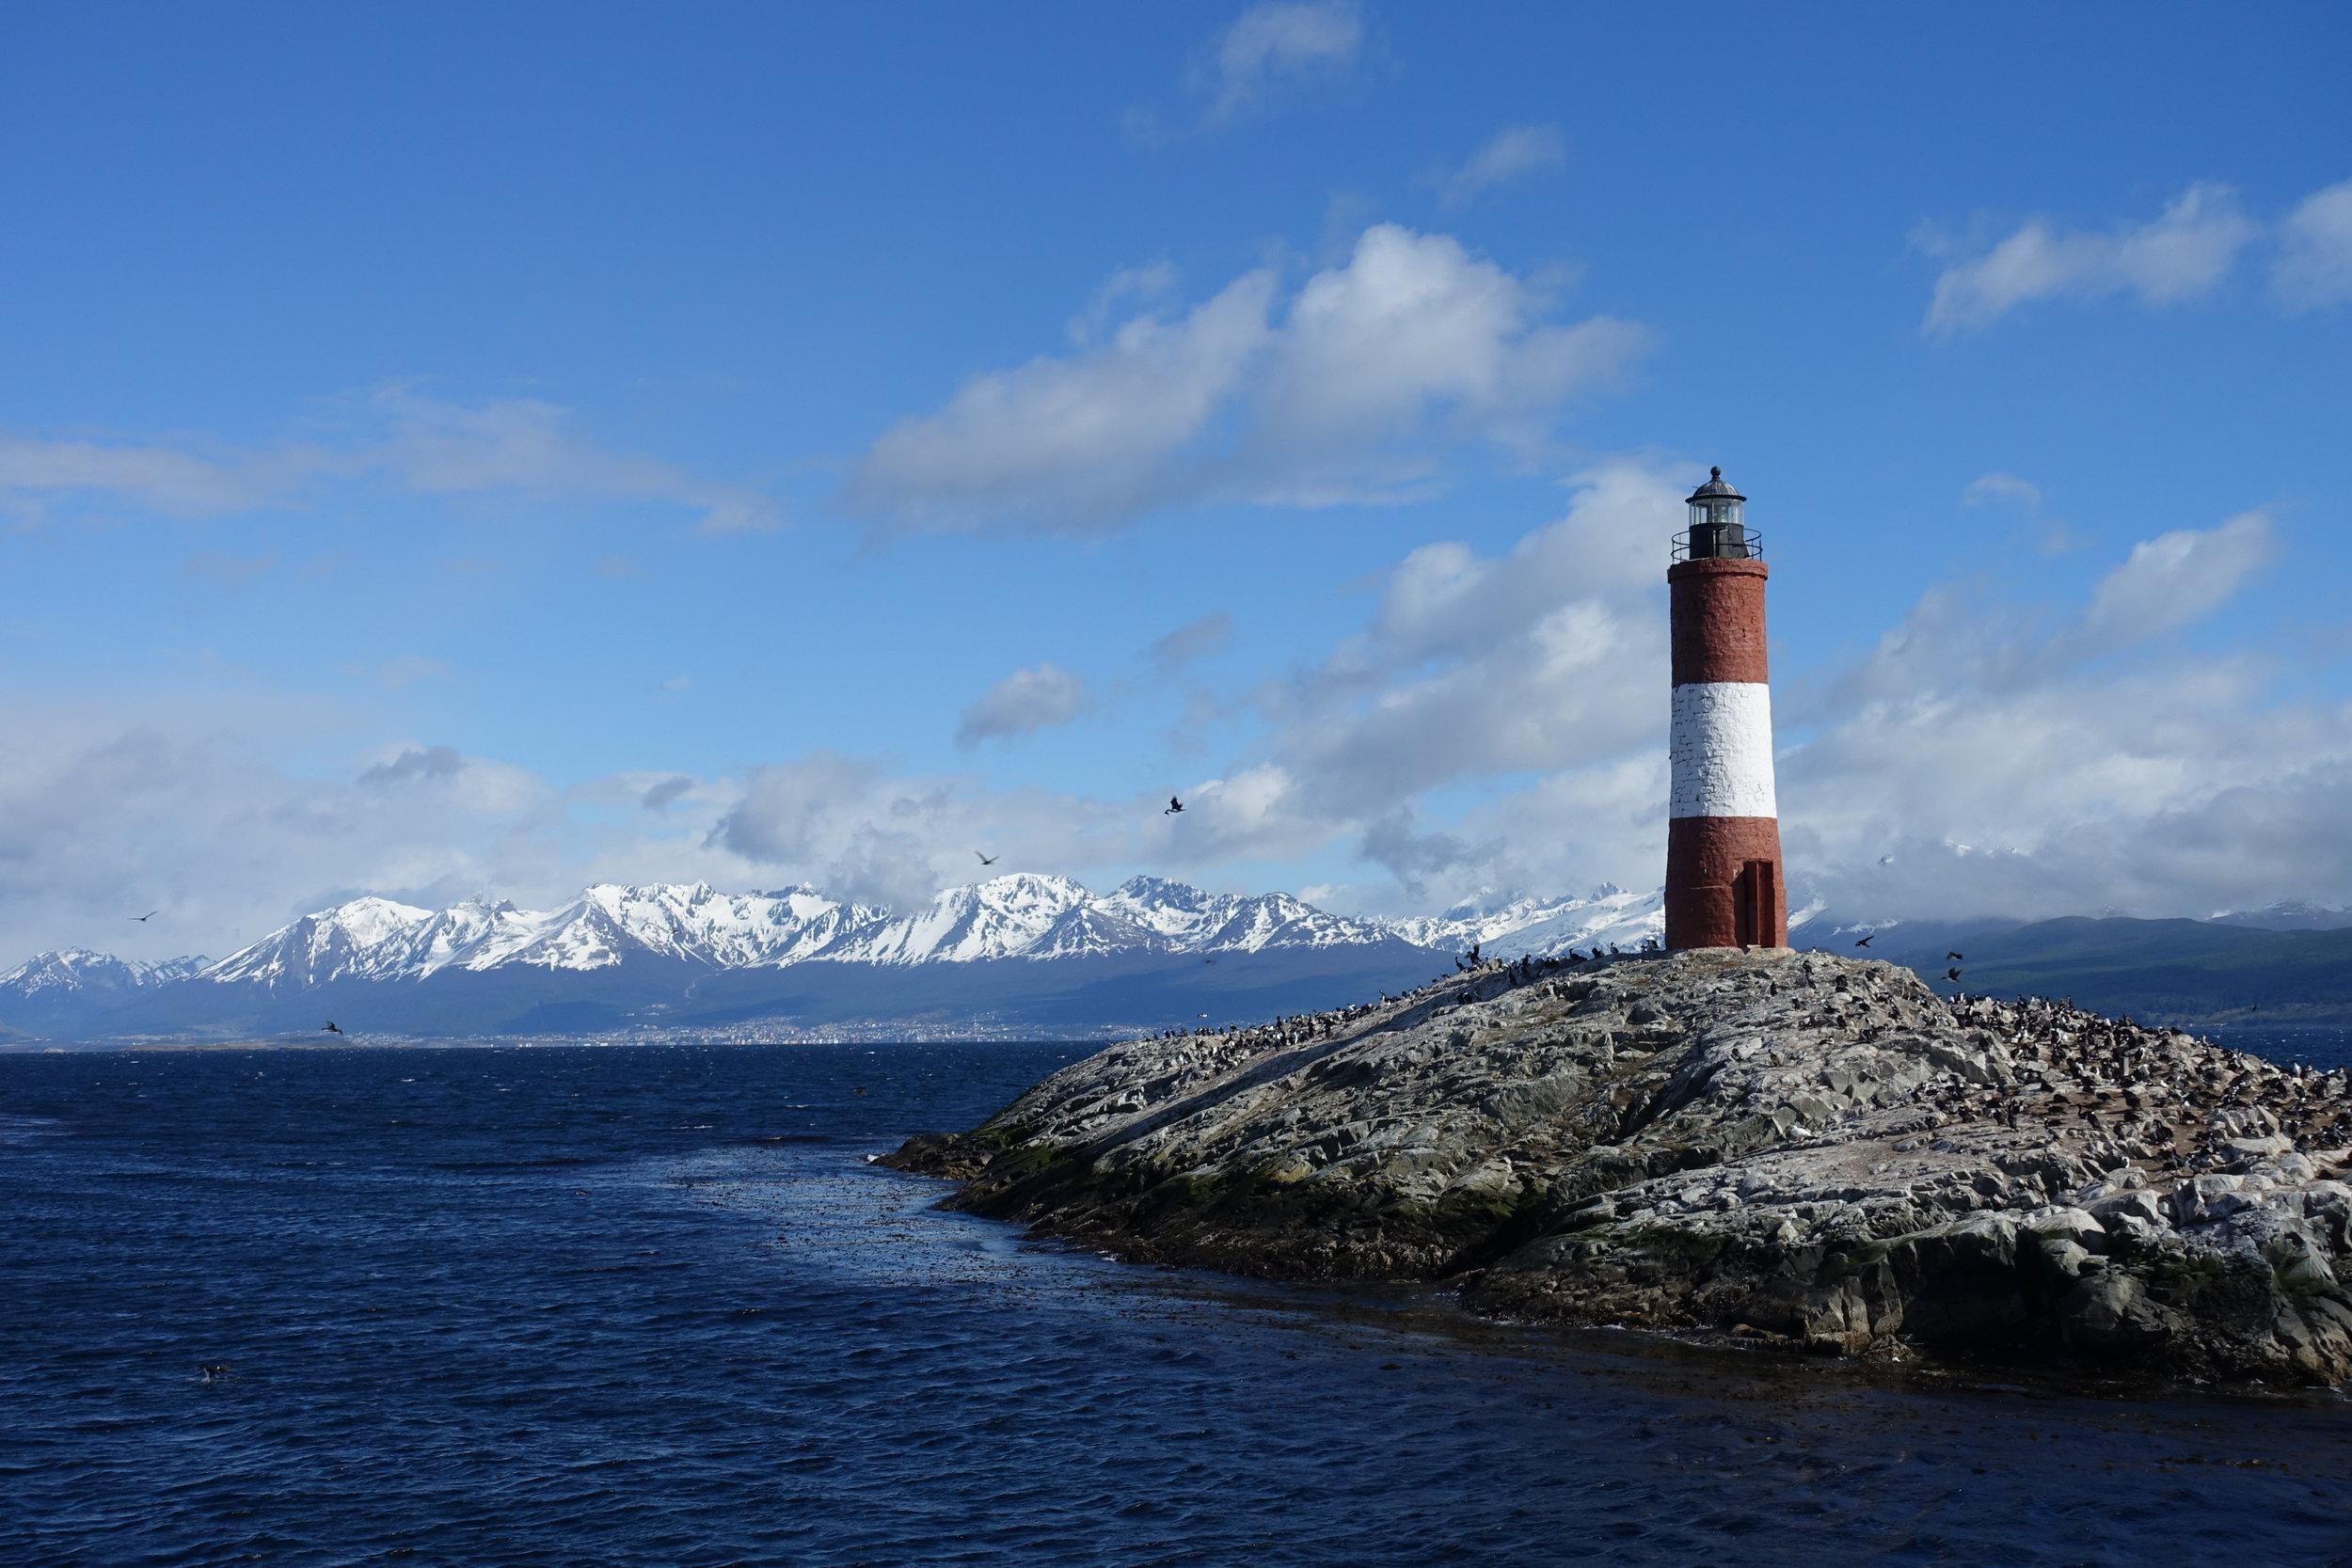 Visit Ushuaia Argentina Sail the Beagle Channel